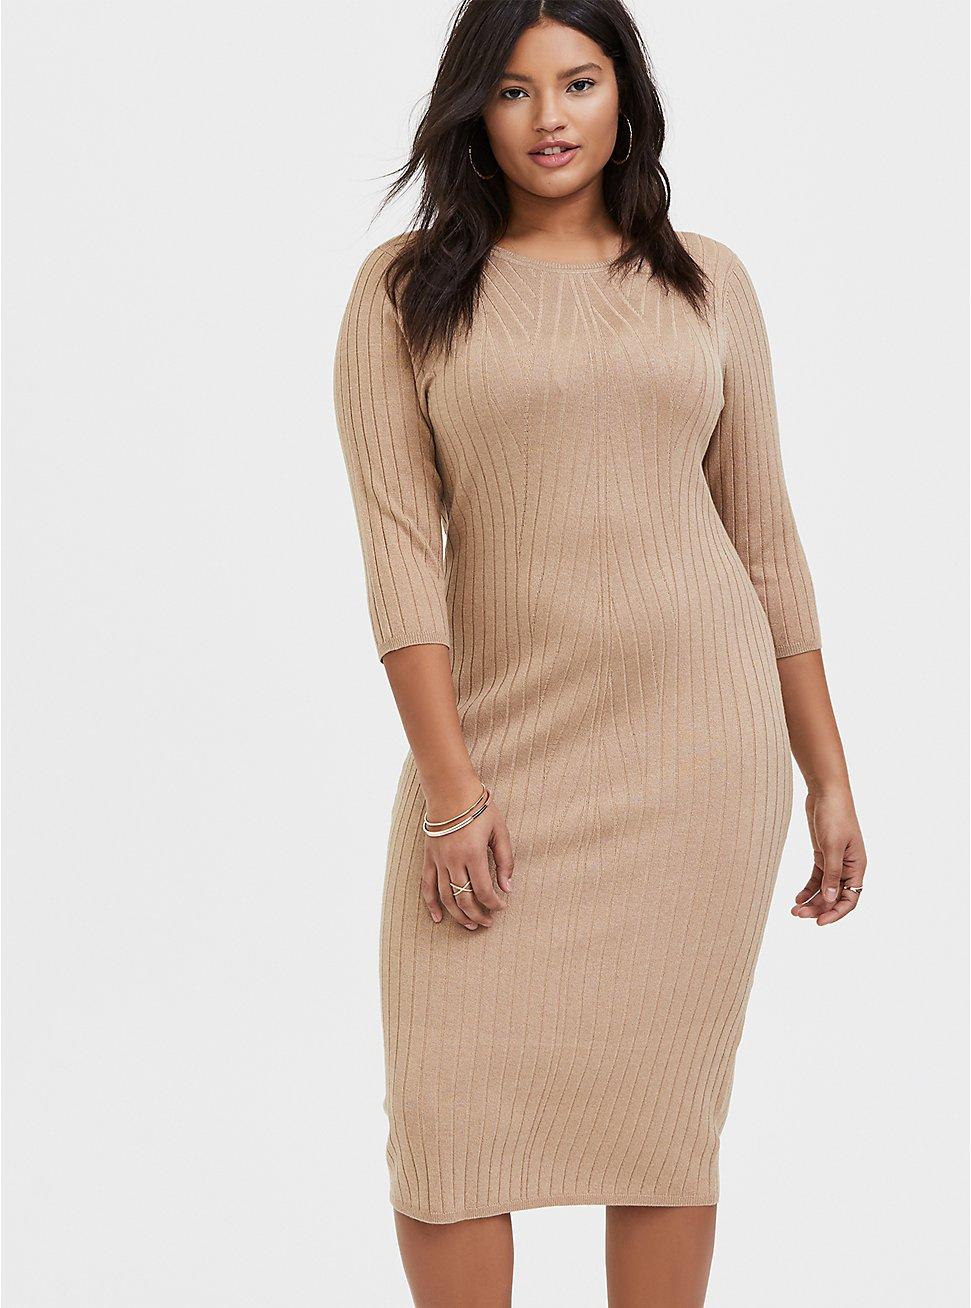 Beige Textured Sweater-Knit Bodycon Midi Dress, , hi-res